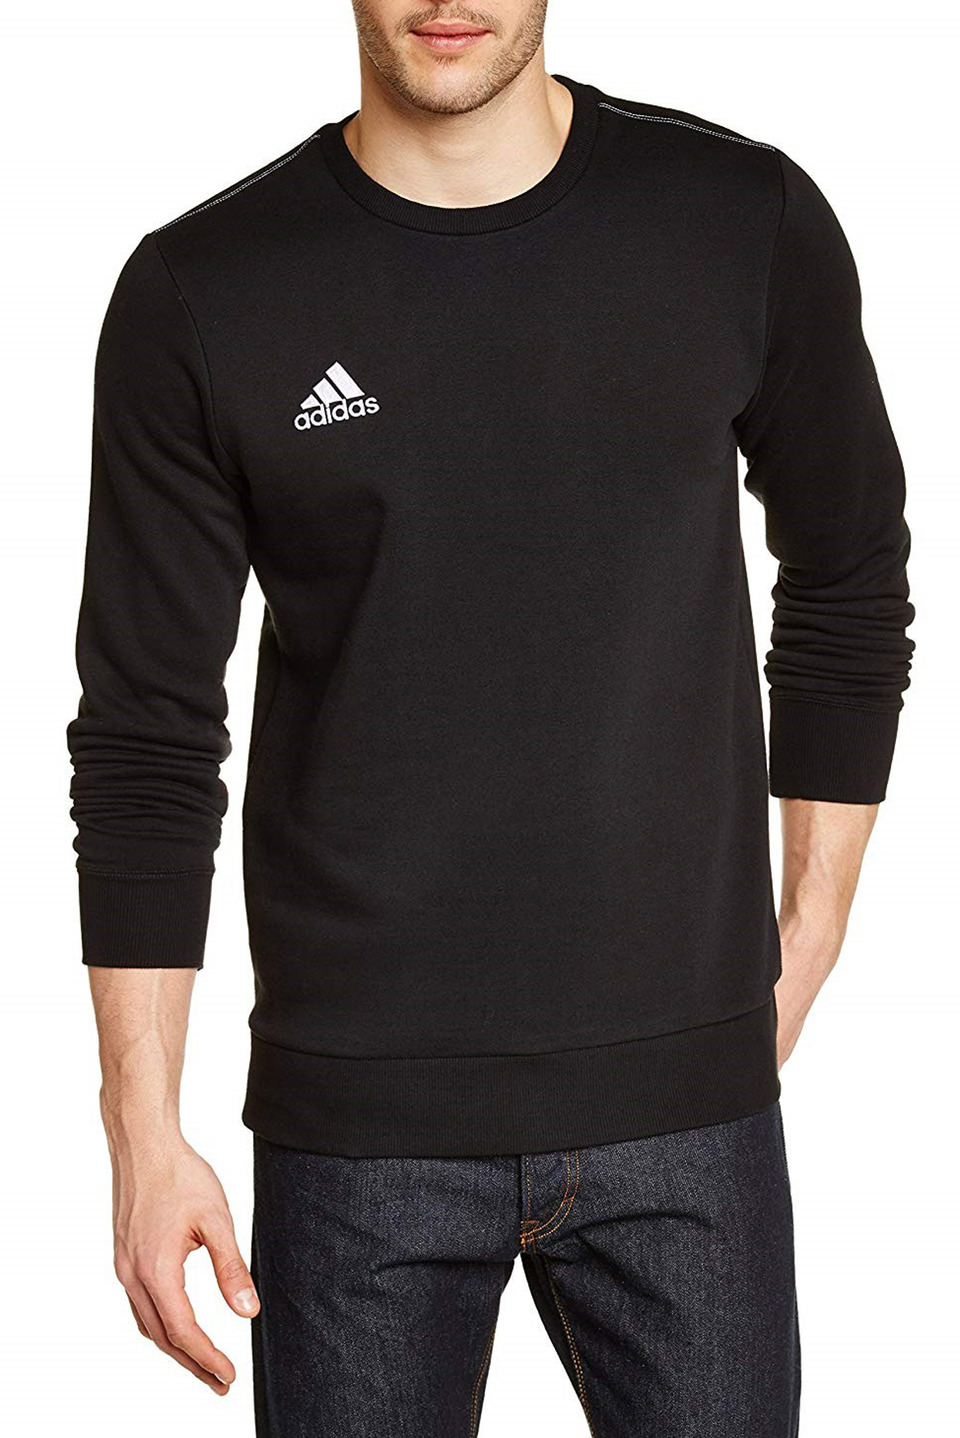 Adidas Core 15 Sweatshirt in Black